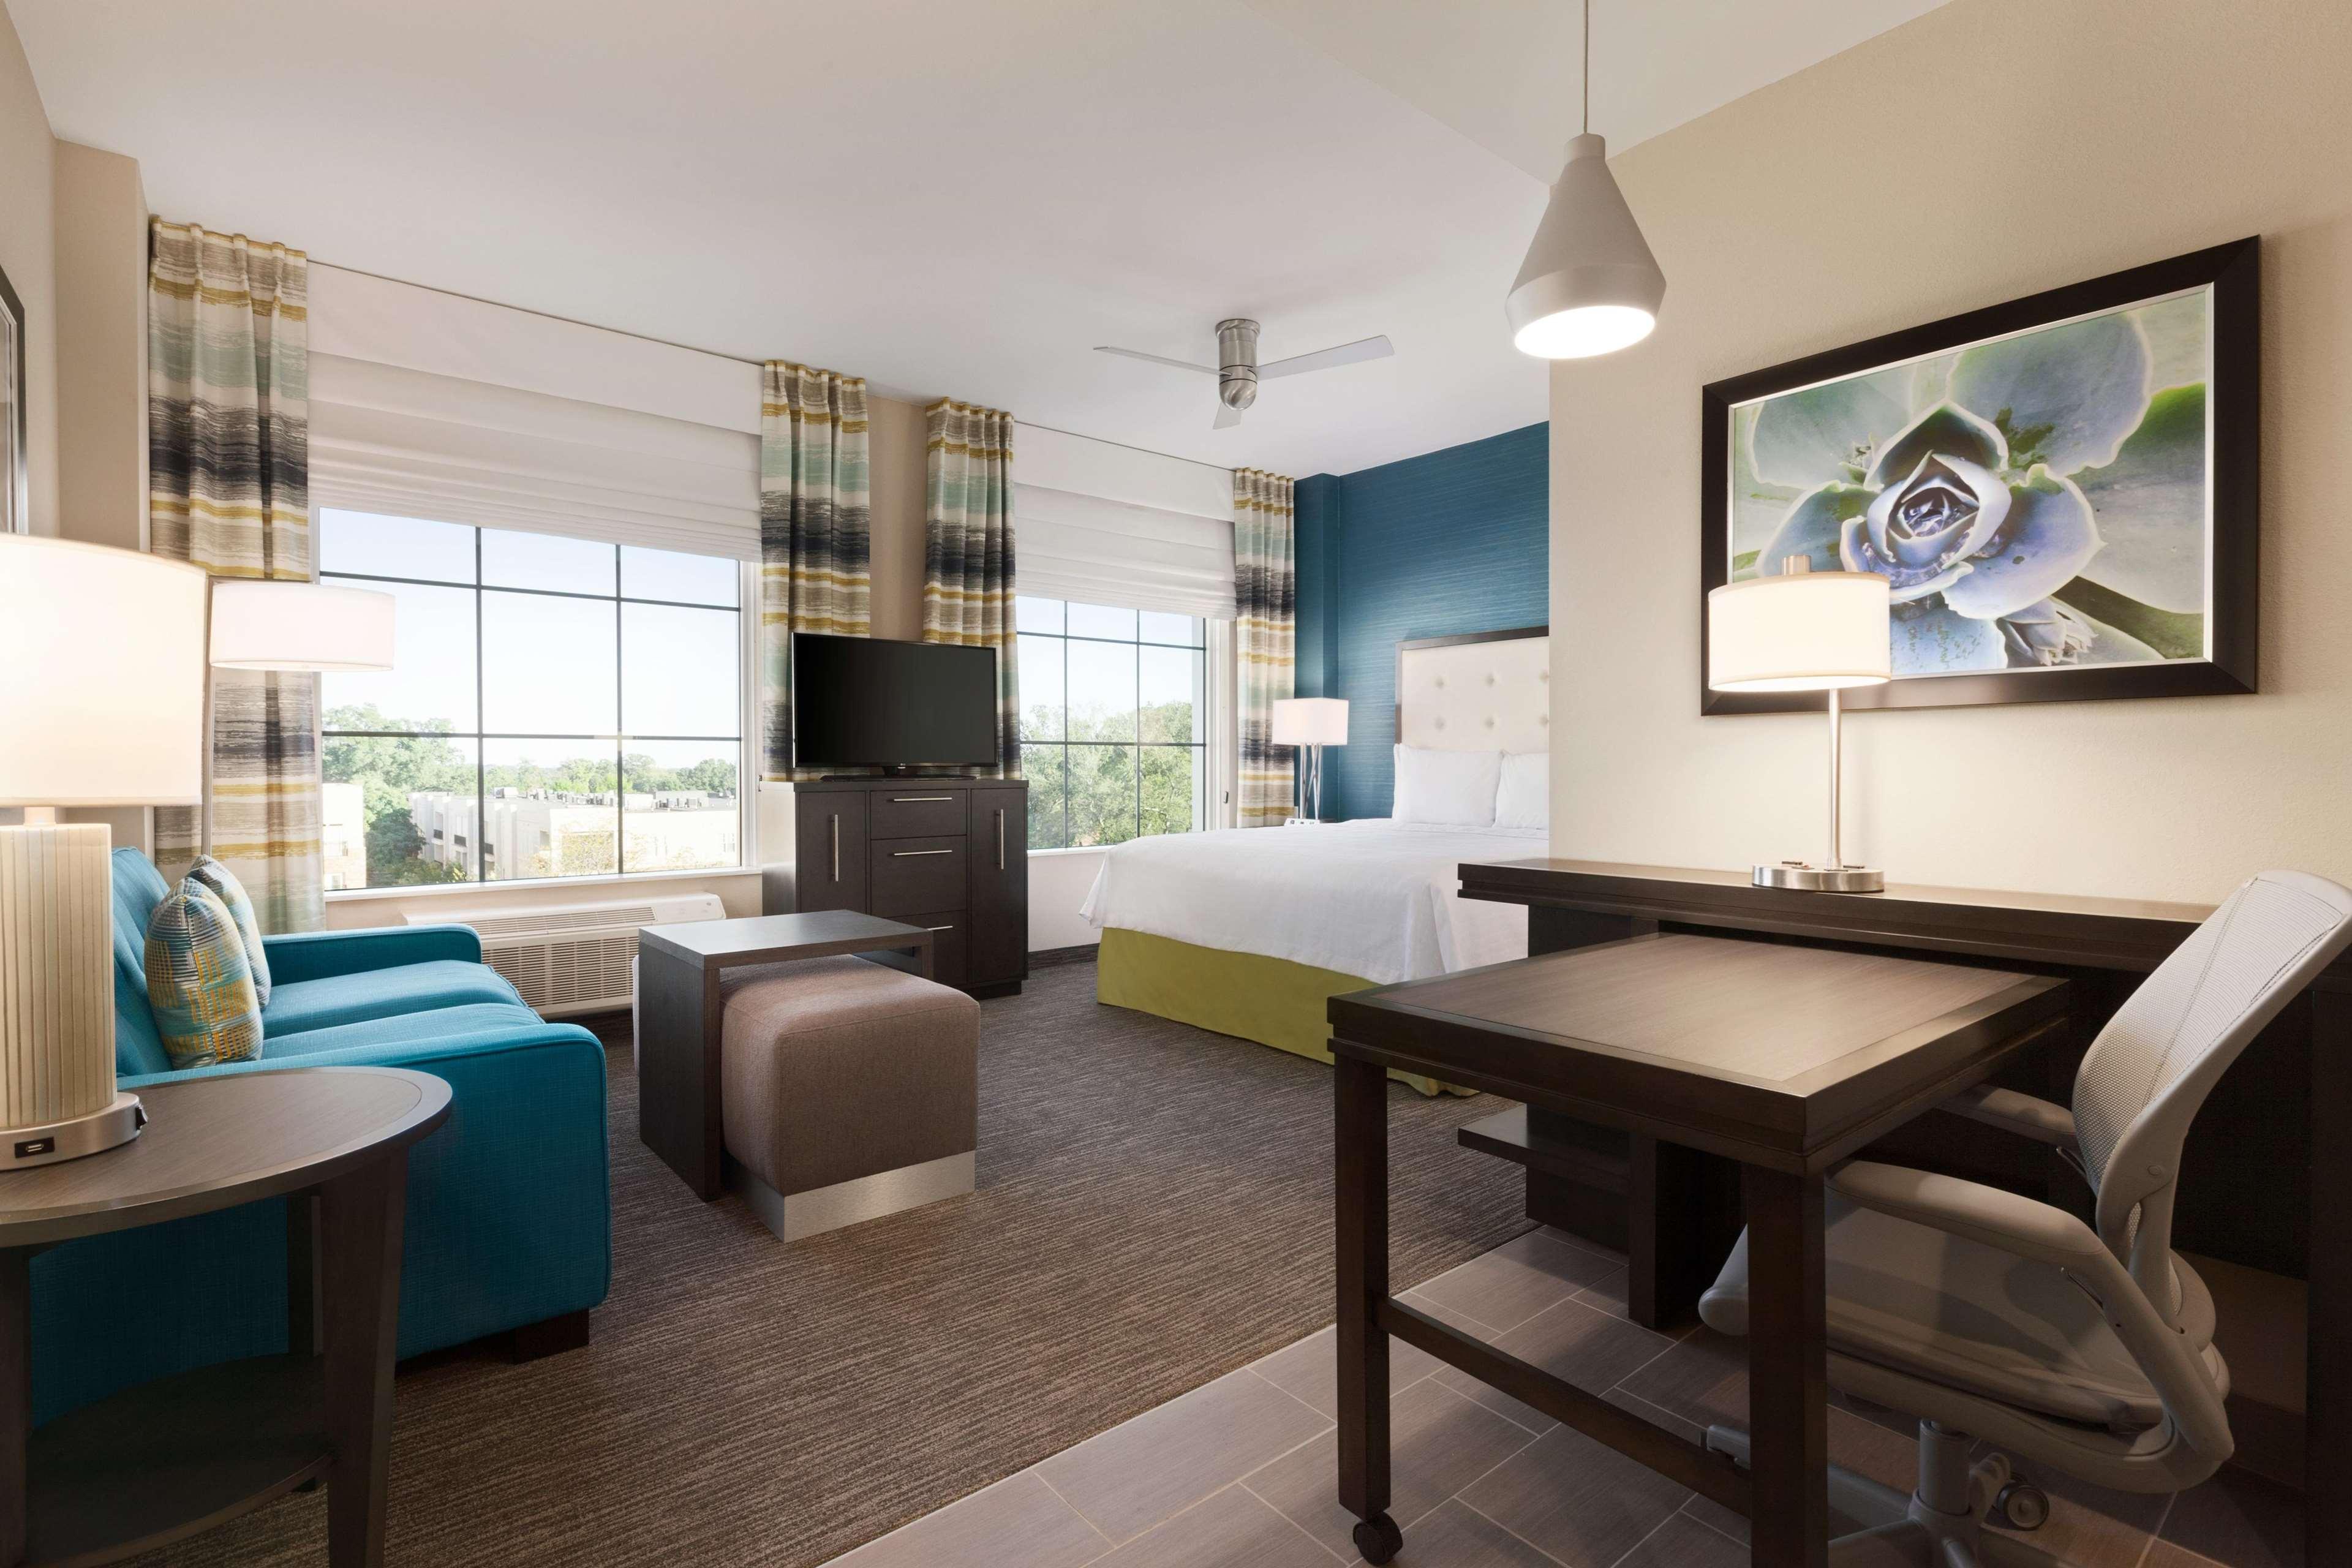 Homewood Suites by Hilton Charlotte/SouthPark image 14